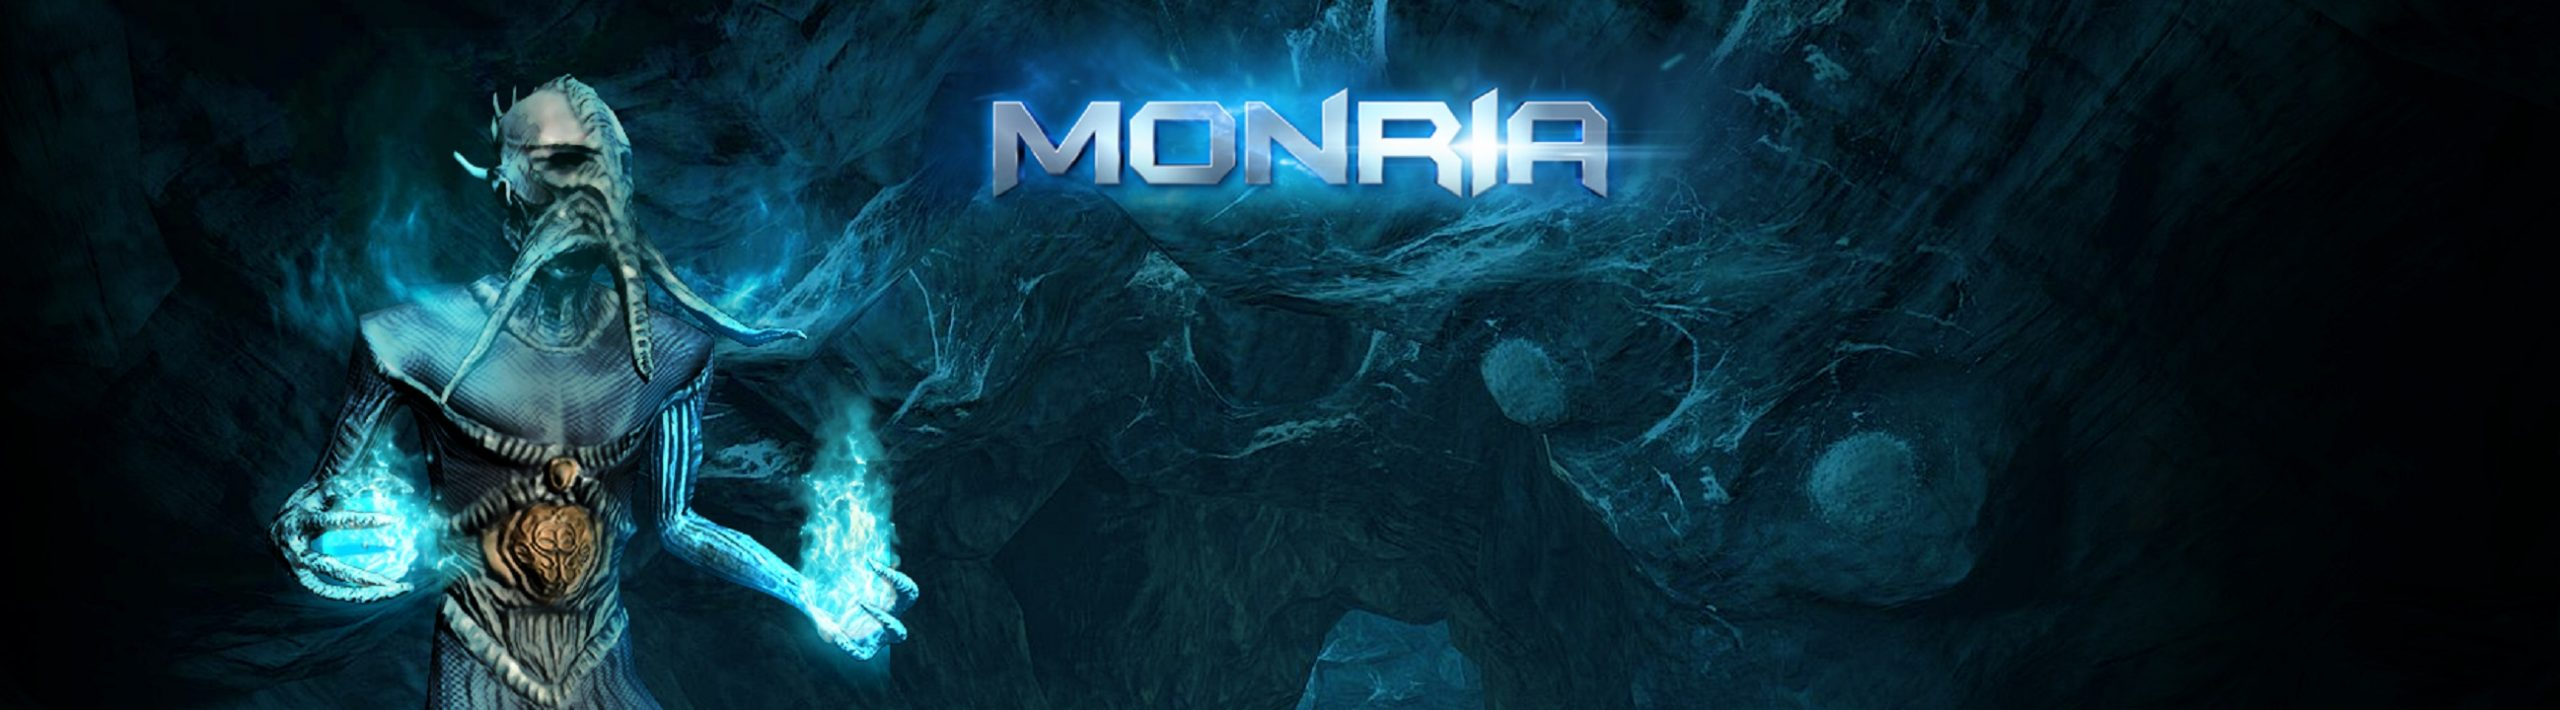 monria-banner-720H